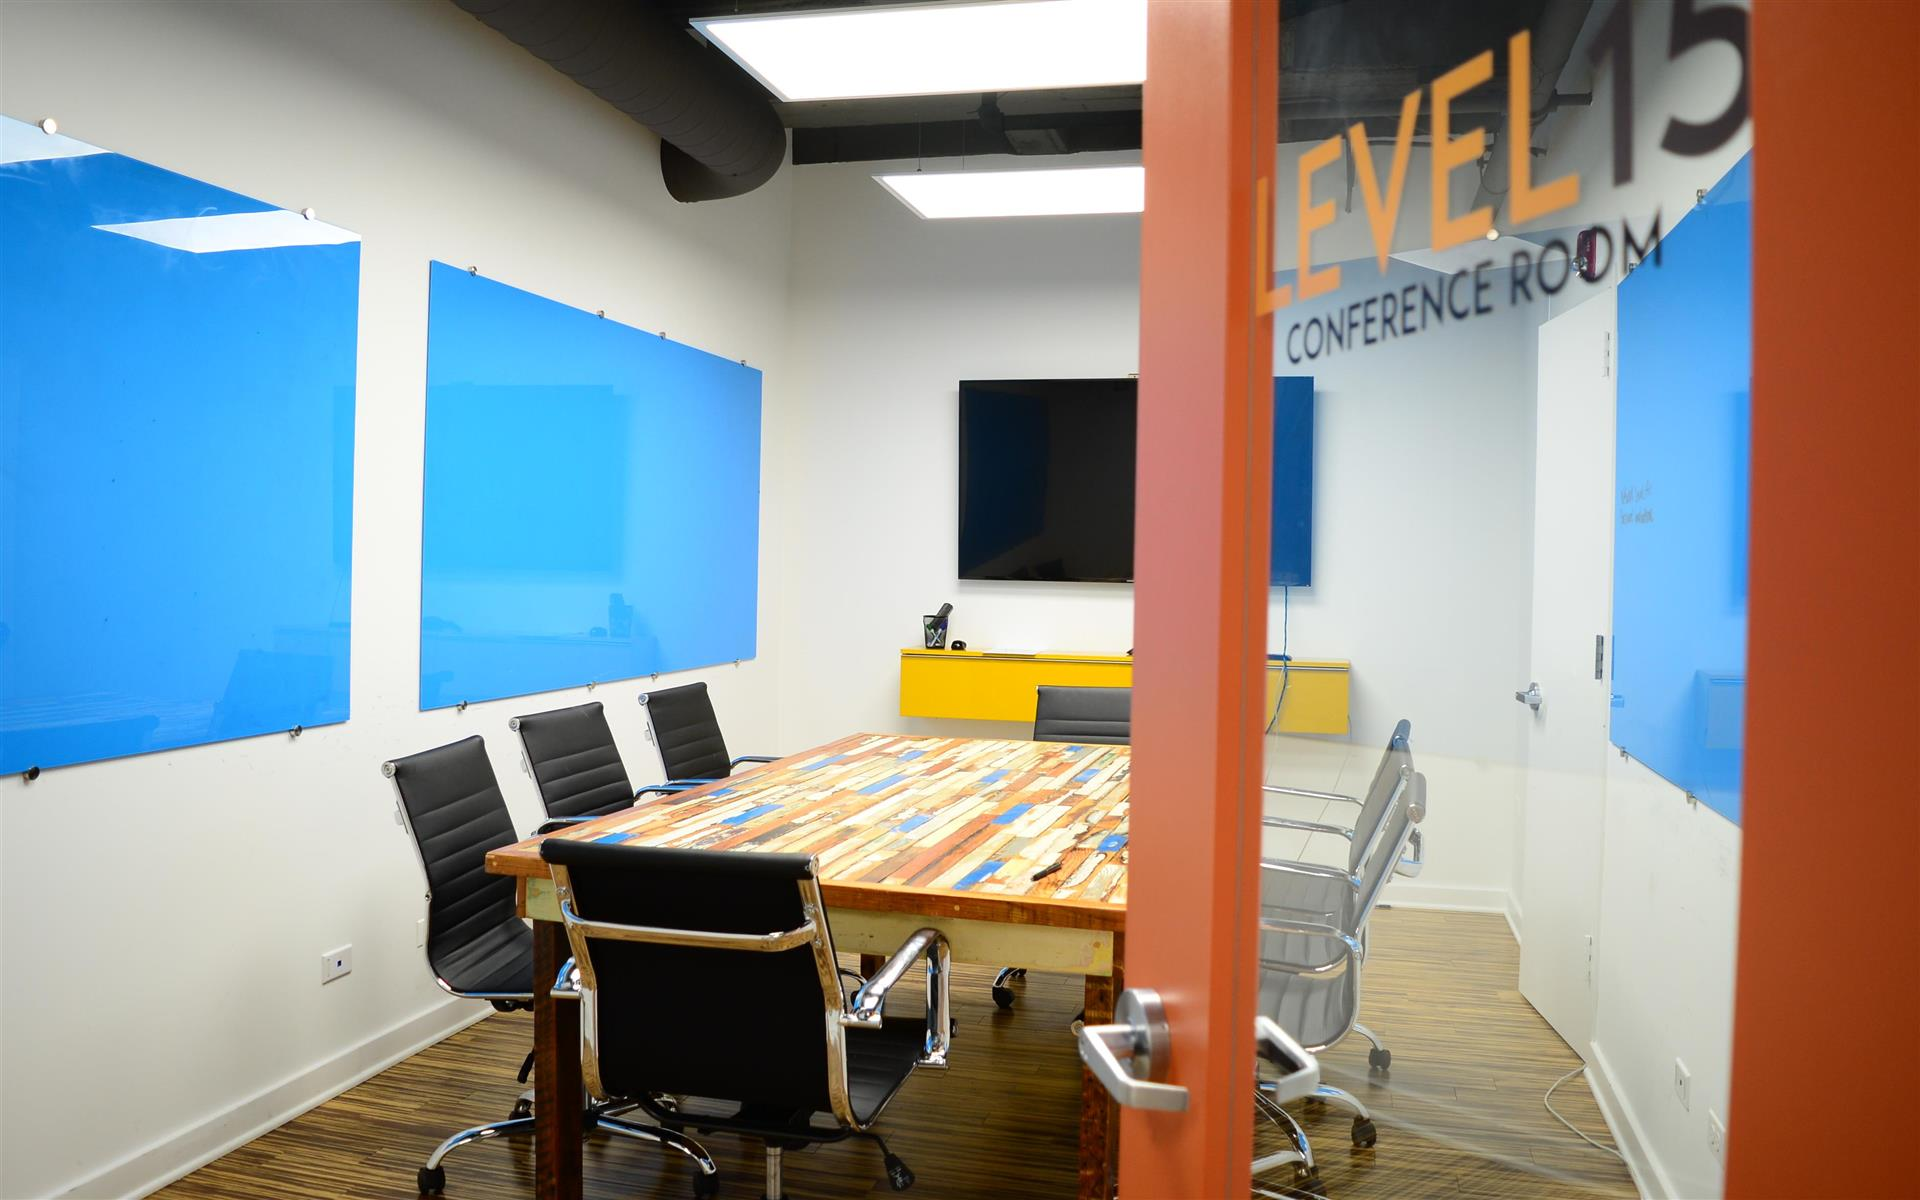 Novel Coworking West Loop - Conference Room 1 at Novel Coworking